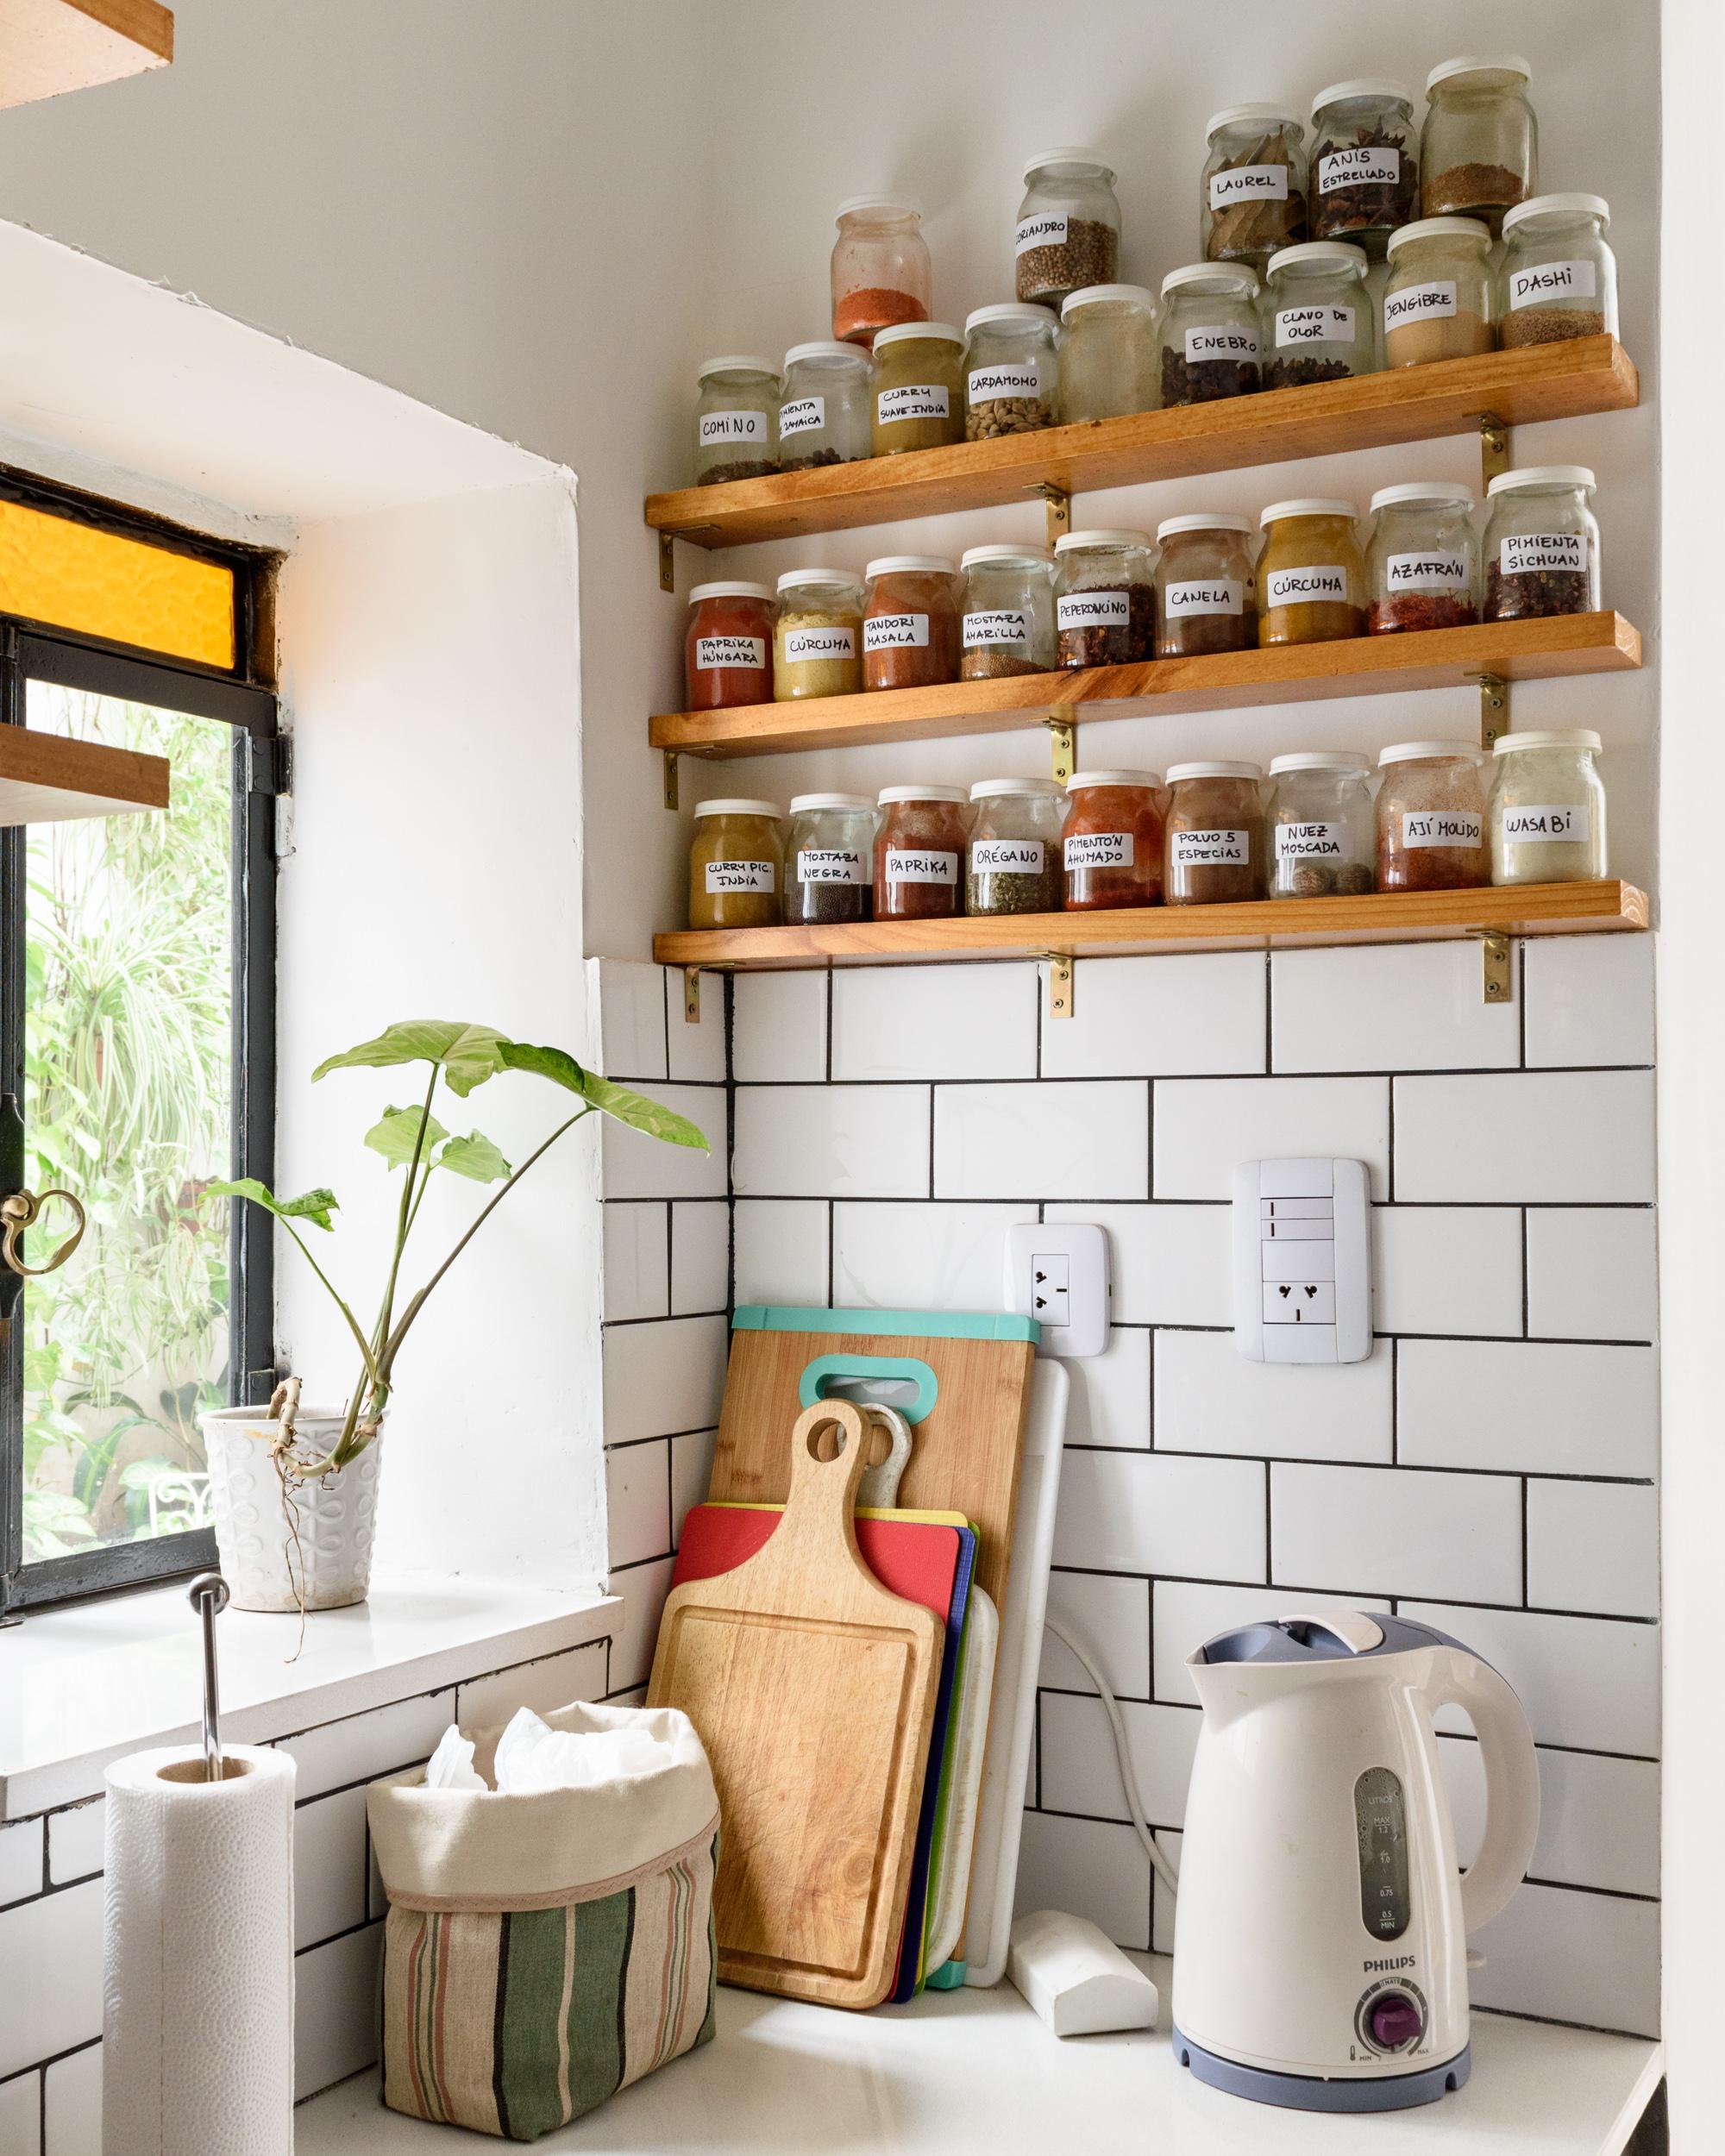 Kitchen pantry (Photo credit: federico paul) GBIWJOO